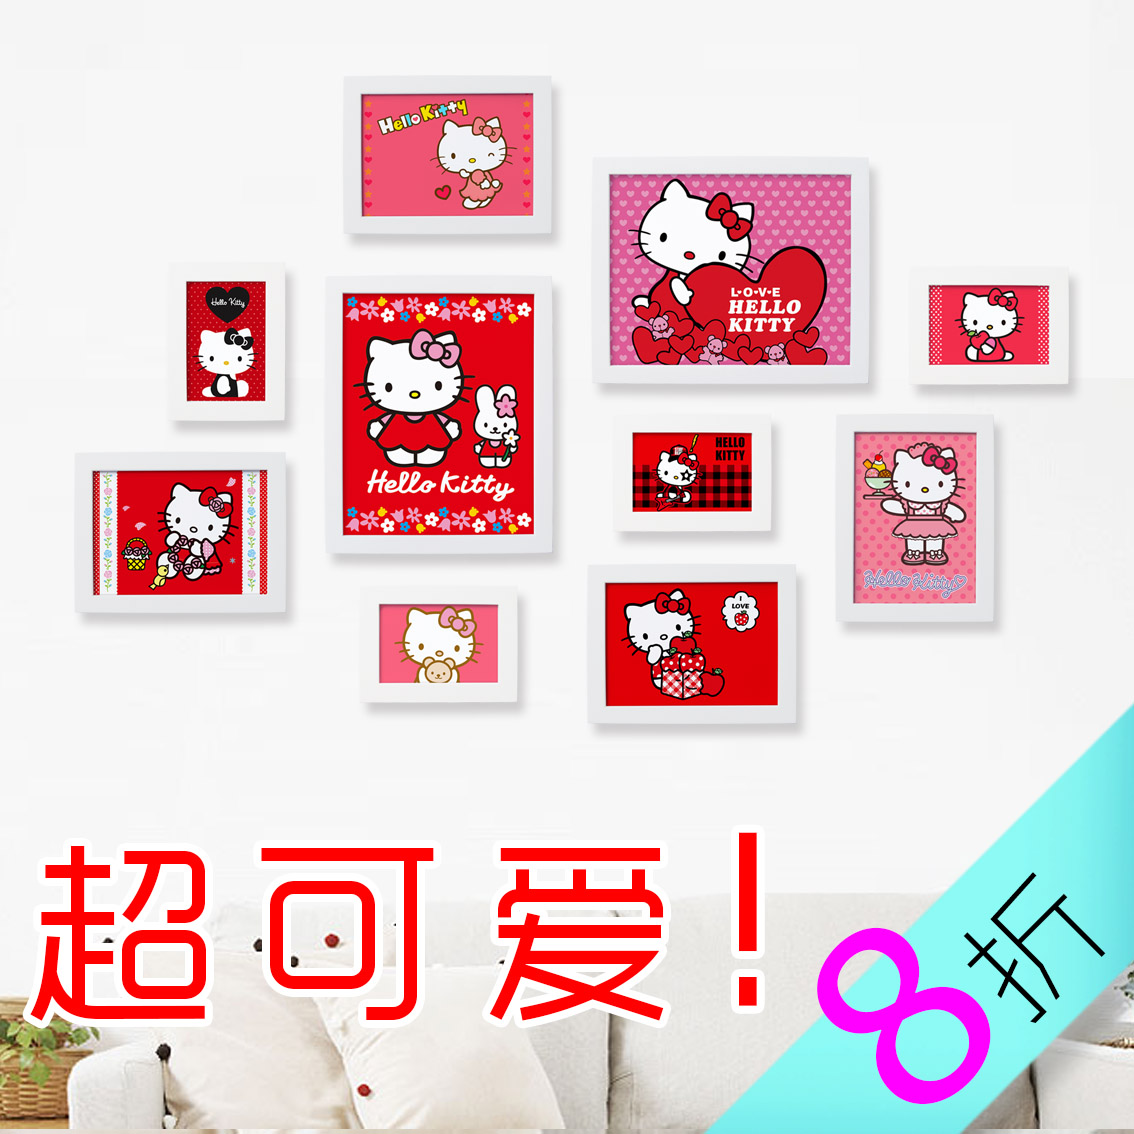 kitty凯蒂猫 照片墙可爱挂画相框画儿童房装饰